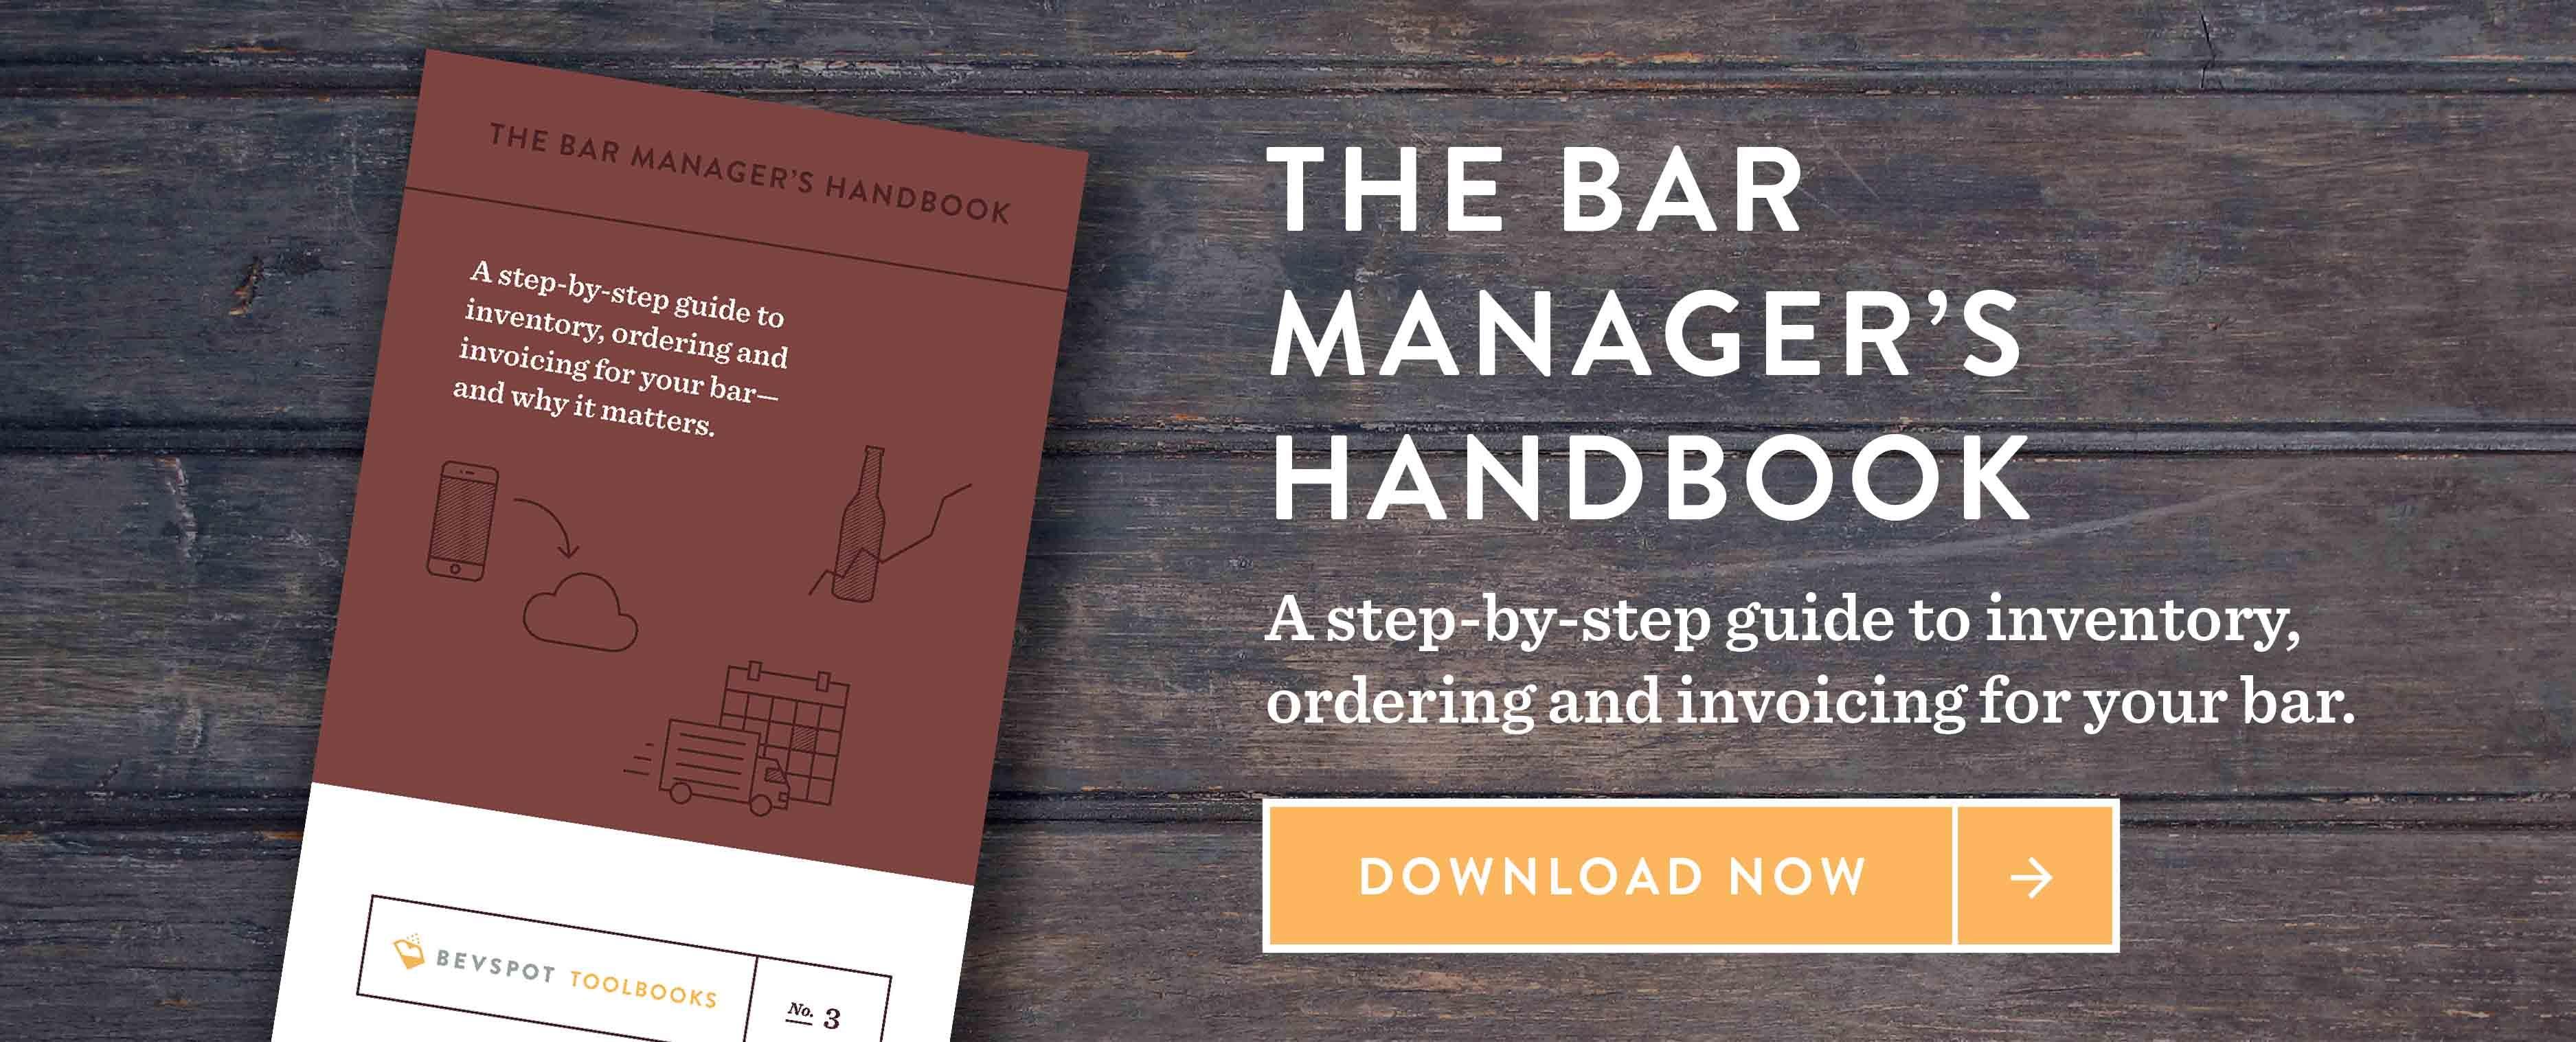 The Bar Manager's Handbook